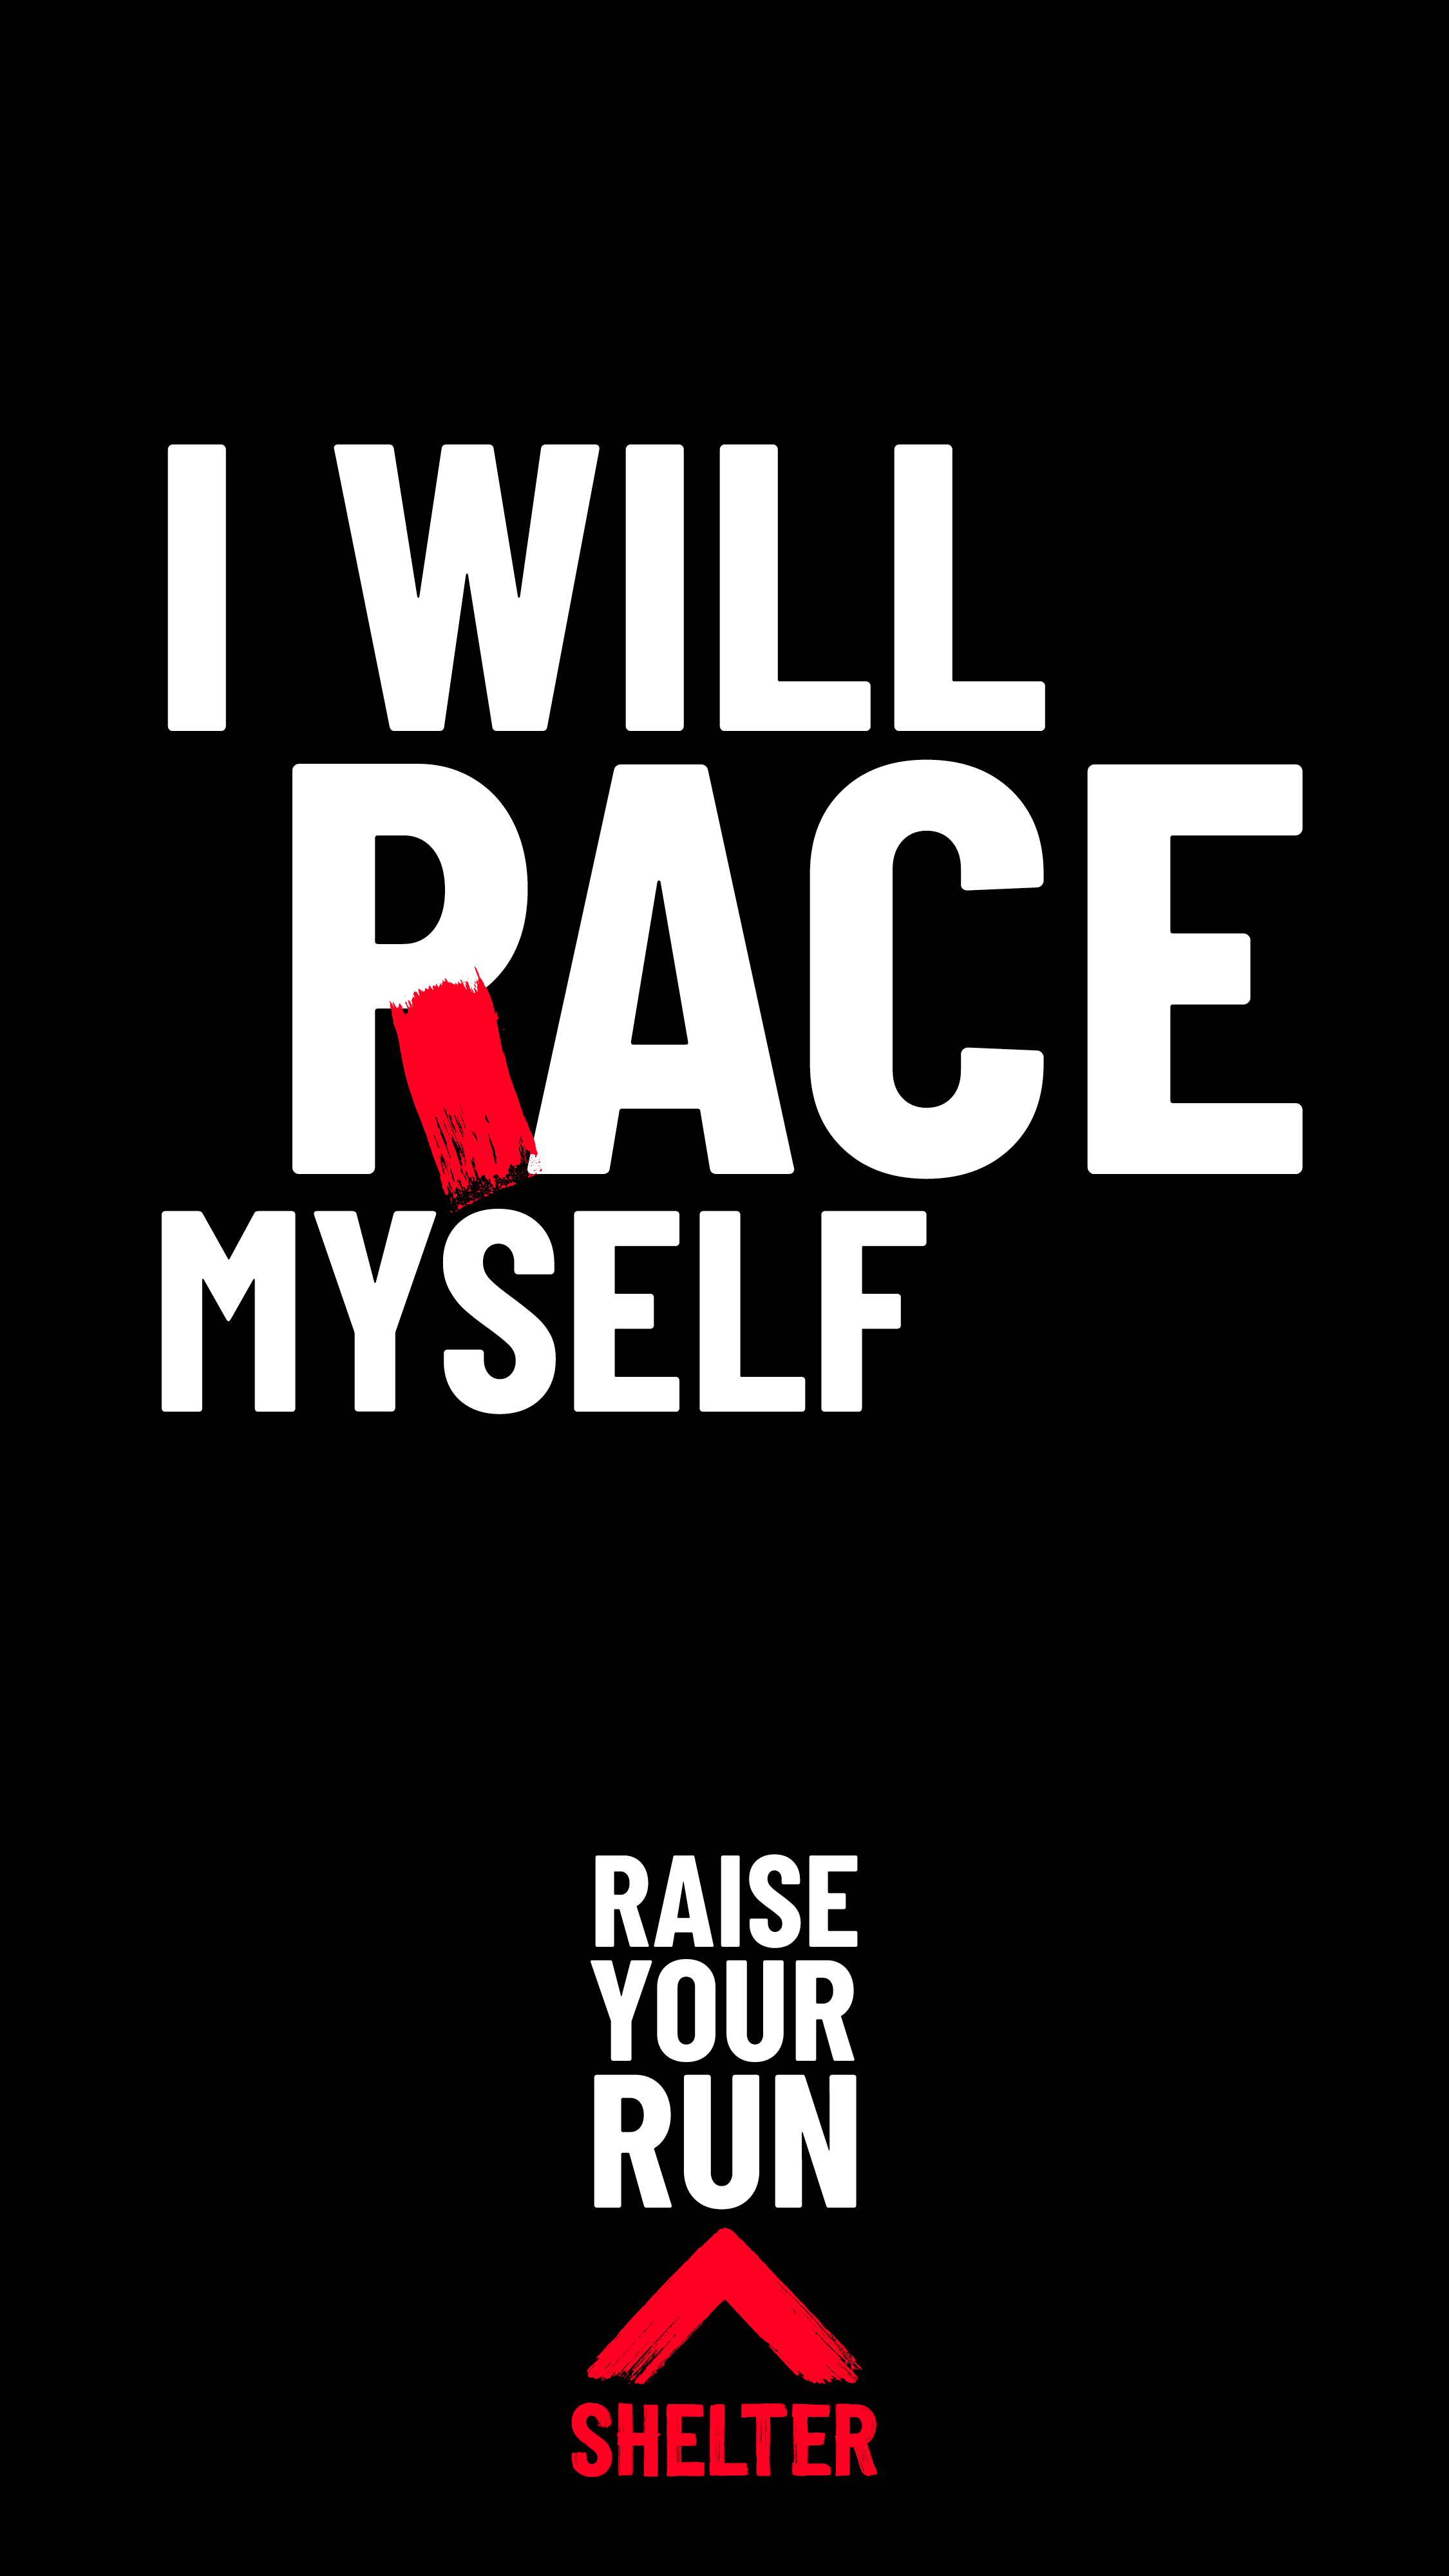 'I will pace myself' wods on black background